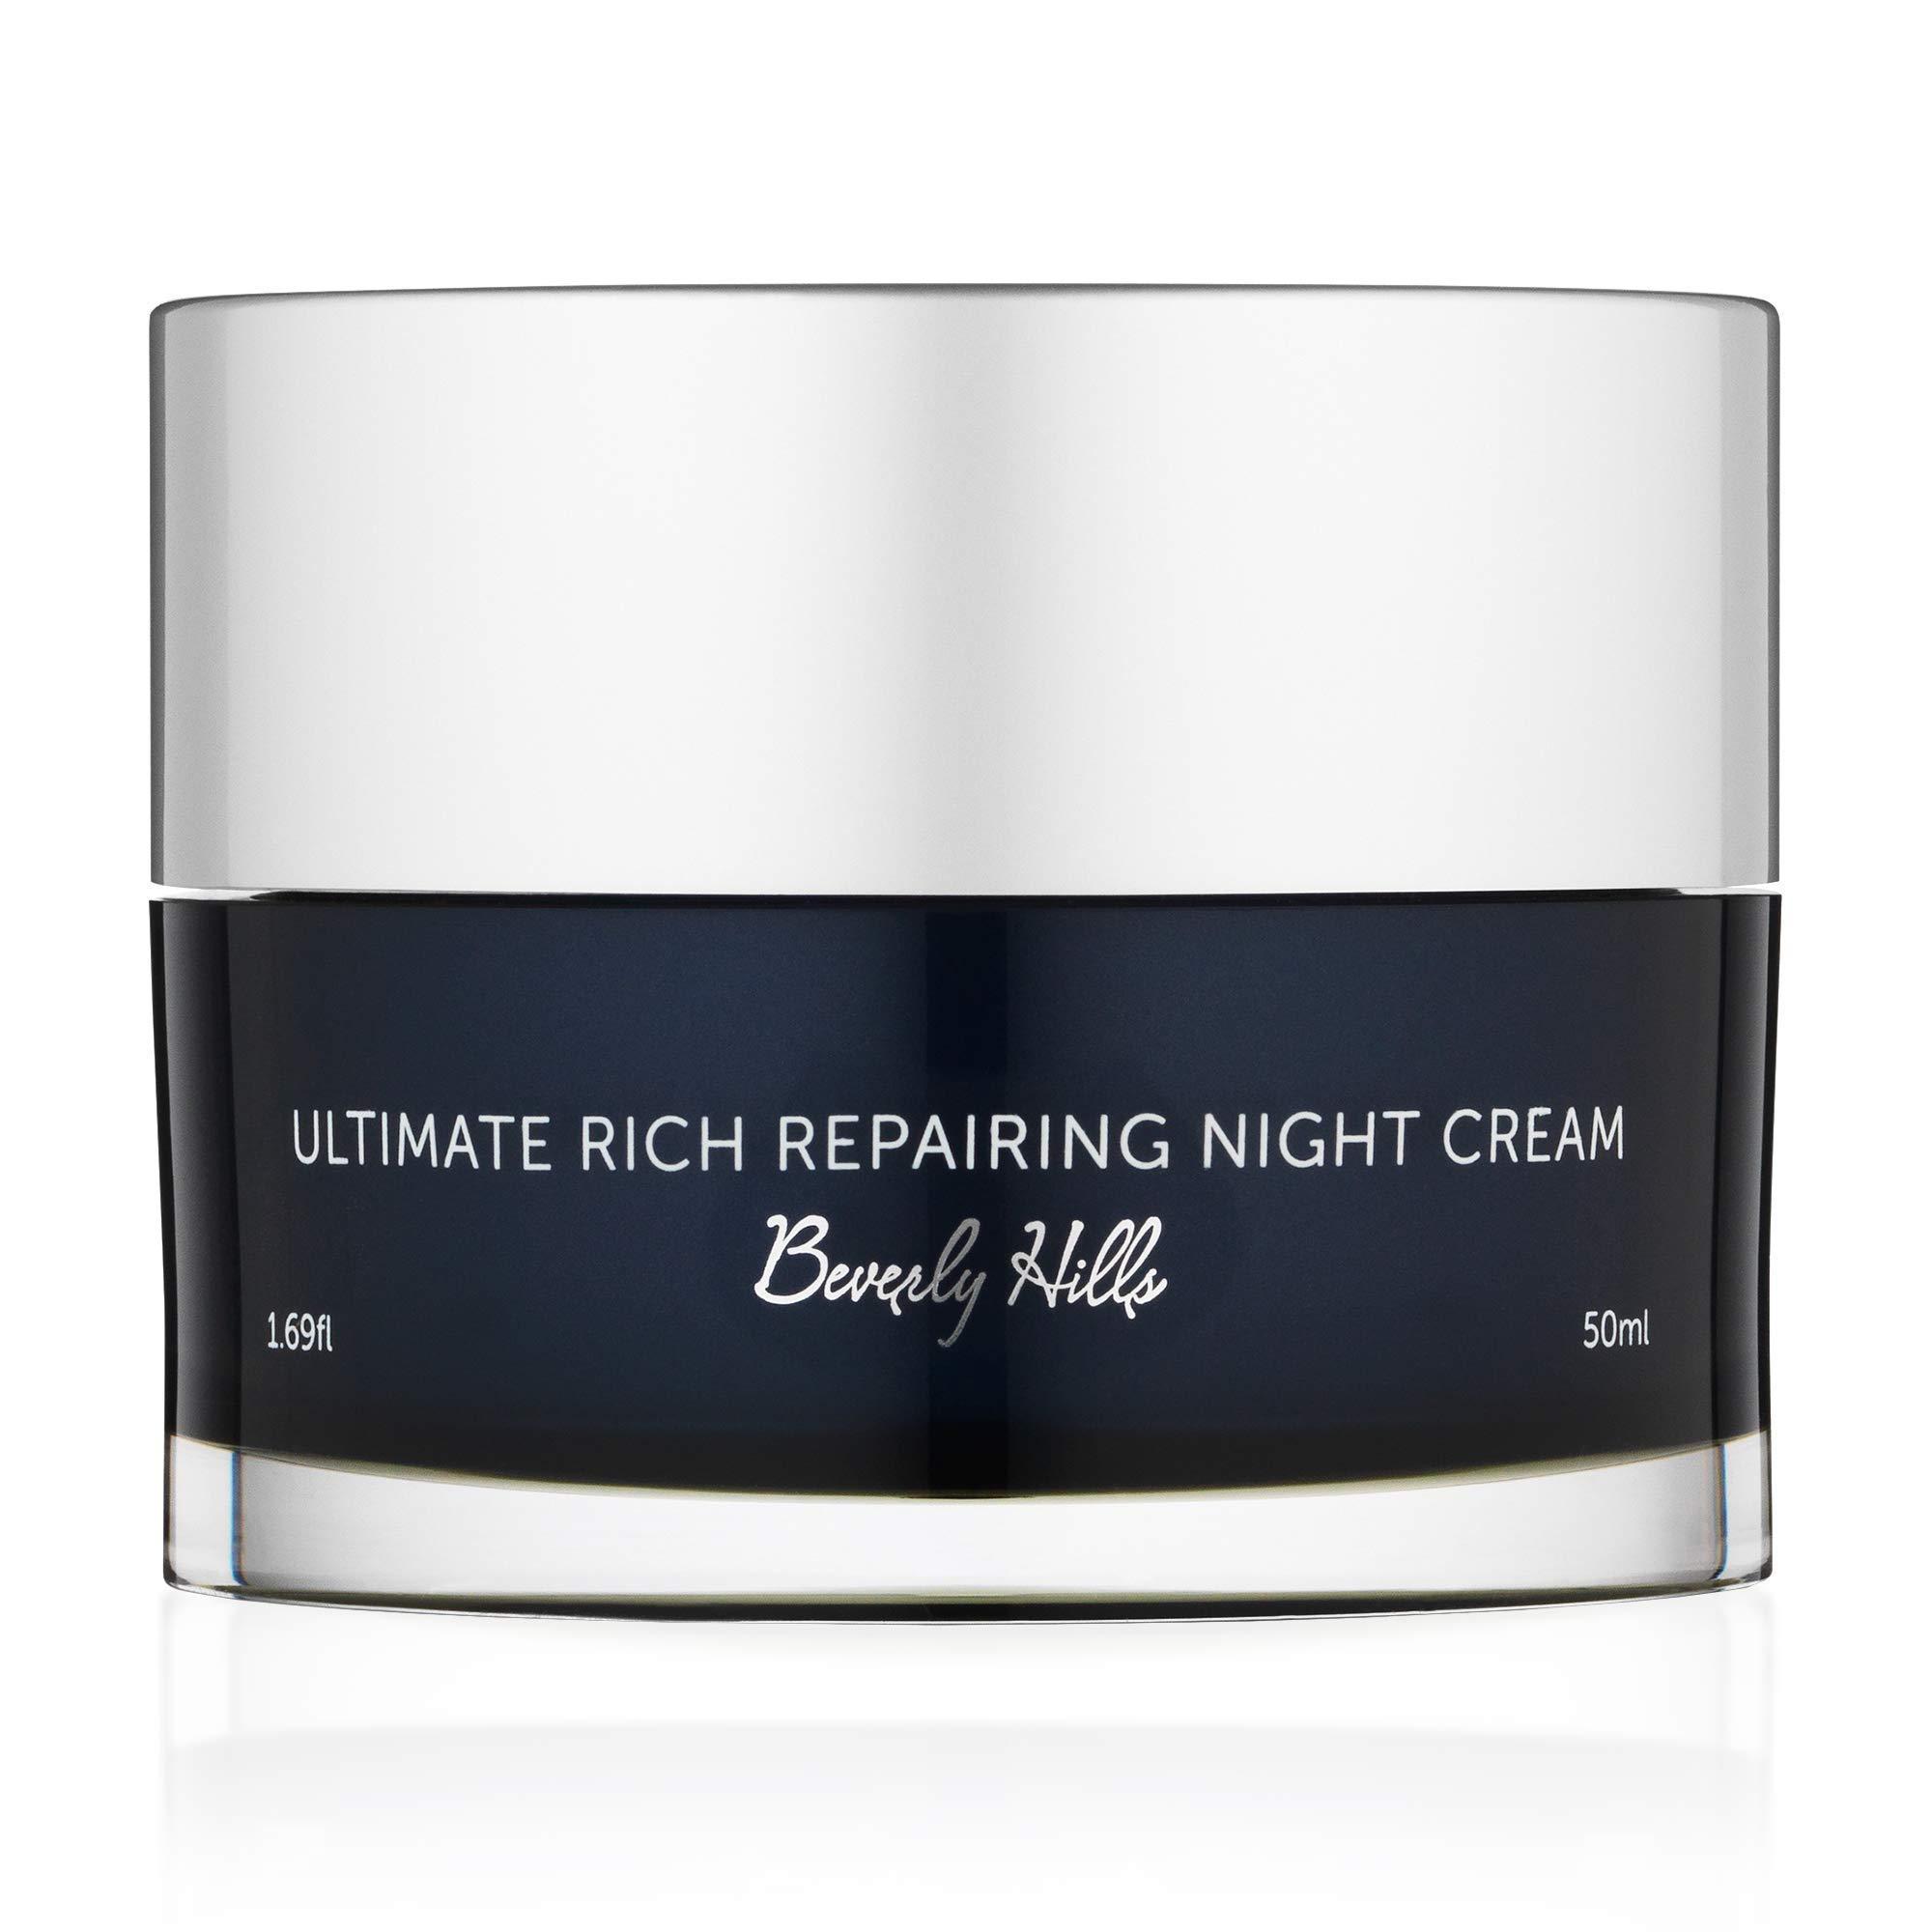 Beverly Hills - Ultimate Rich Repairing Night Cream 50ml/1.69 oz